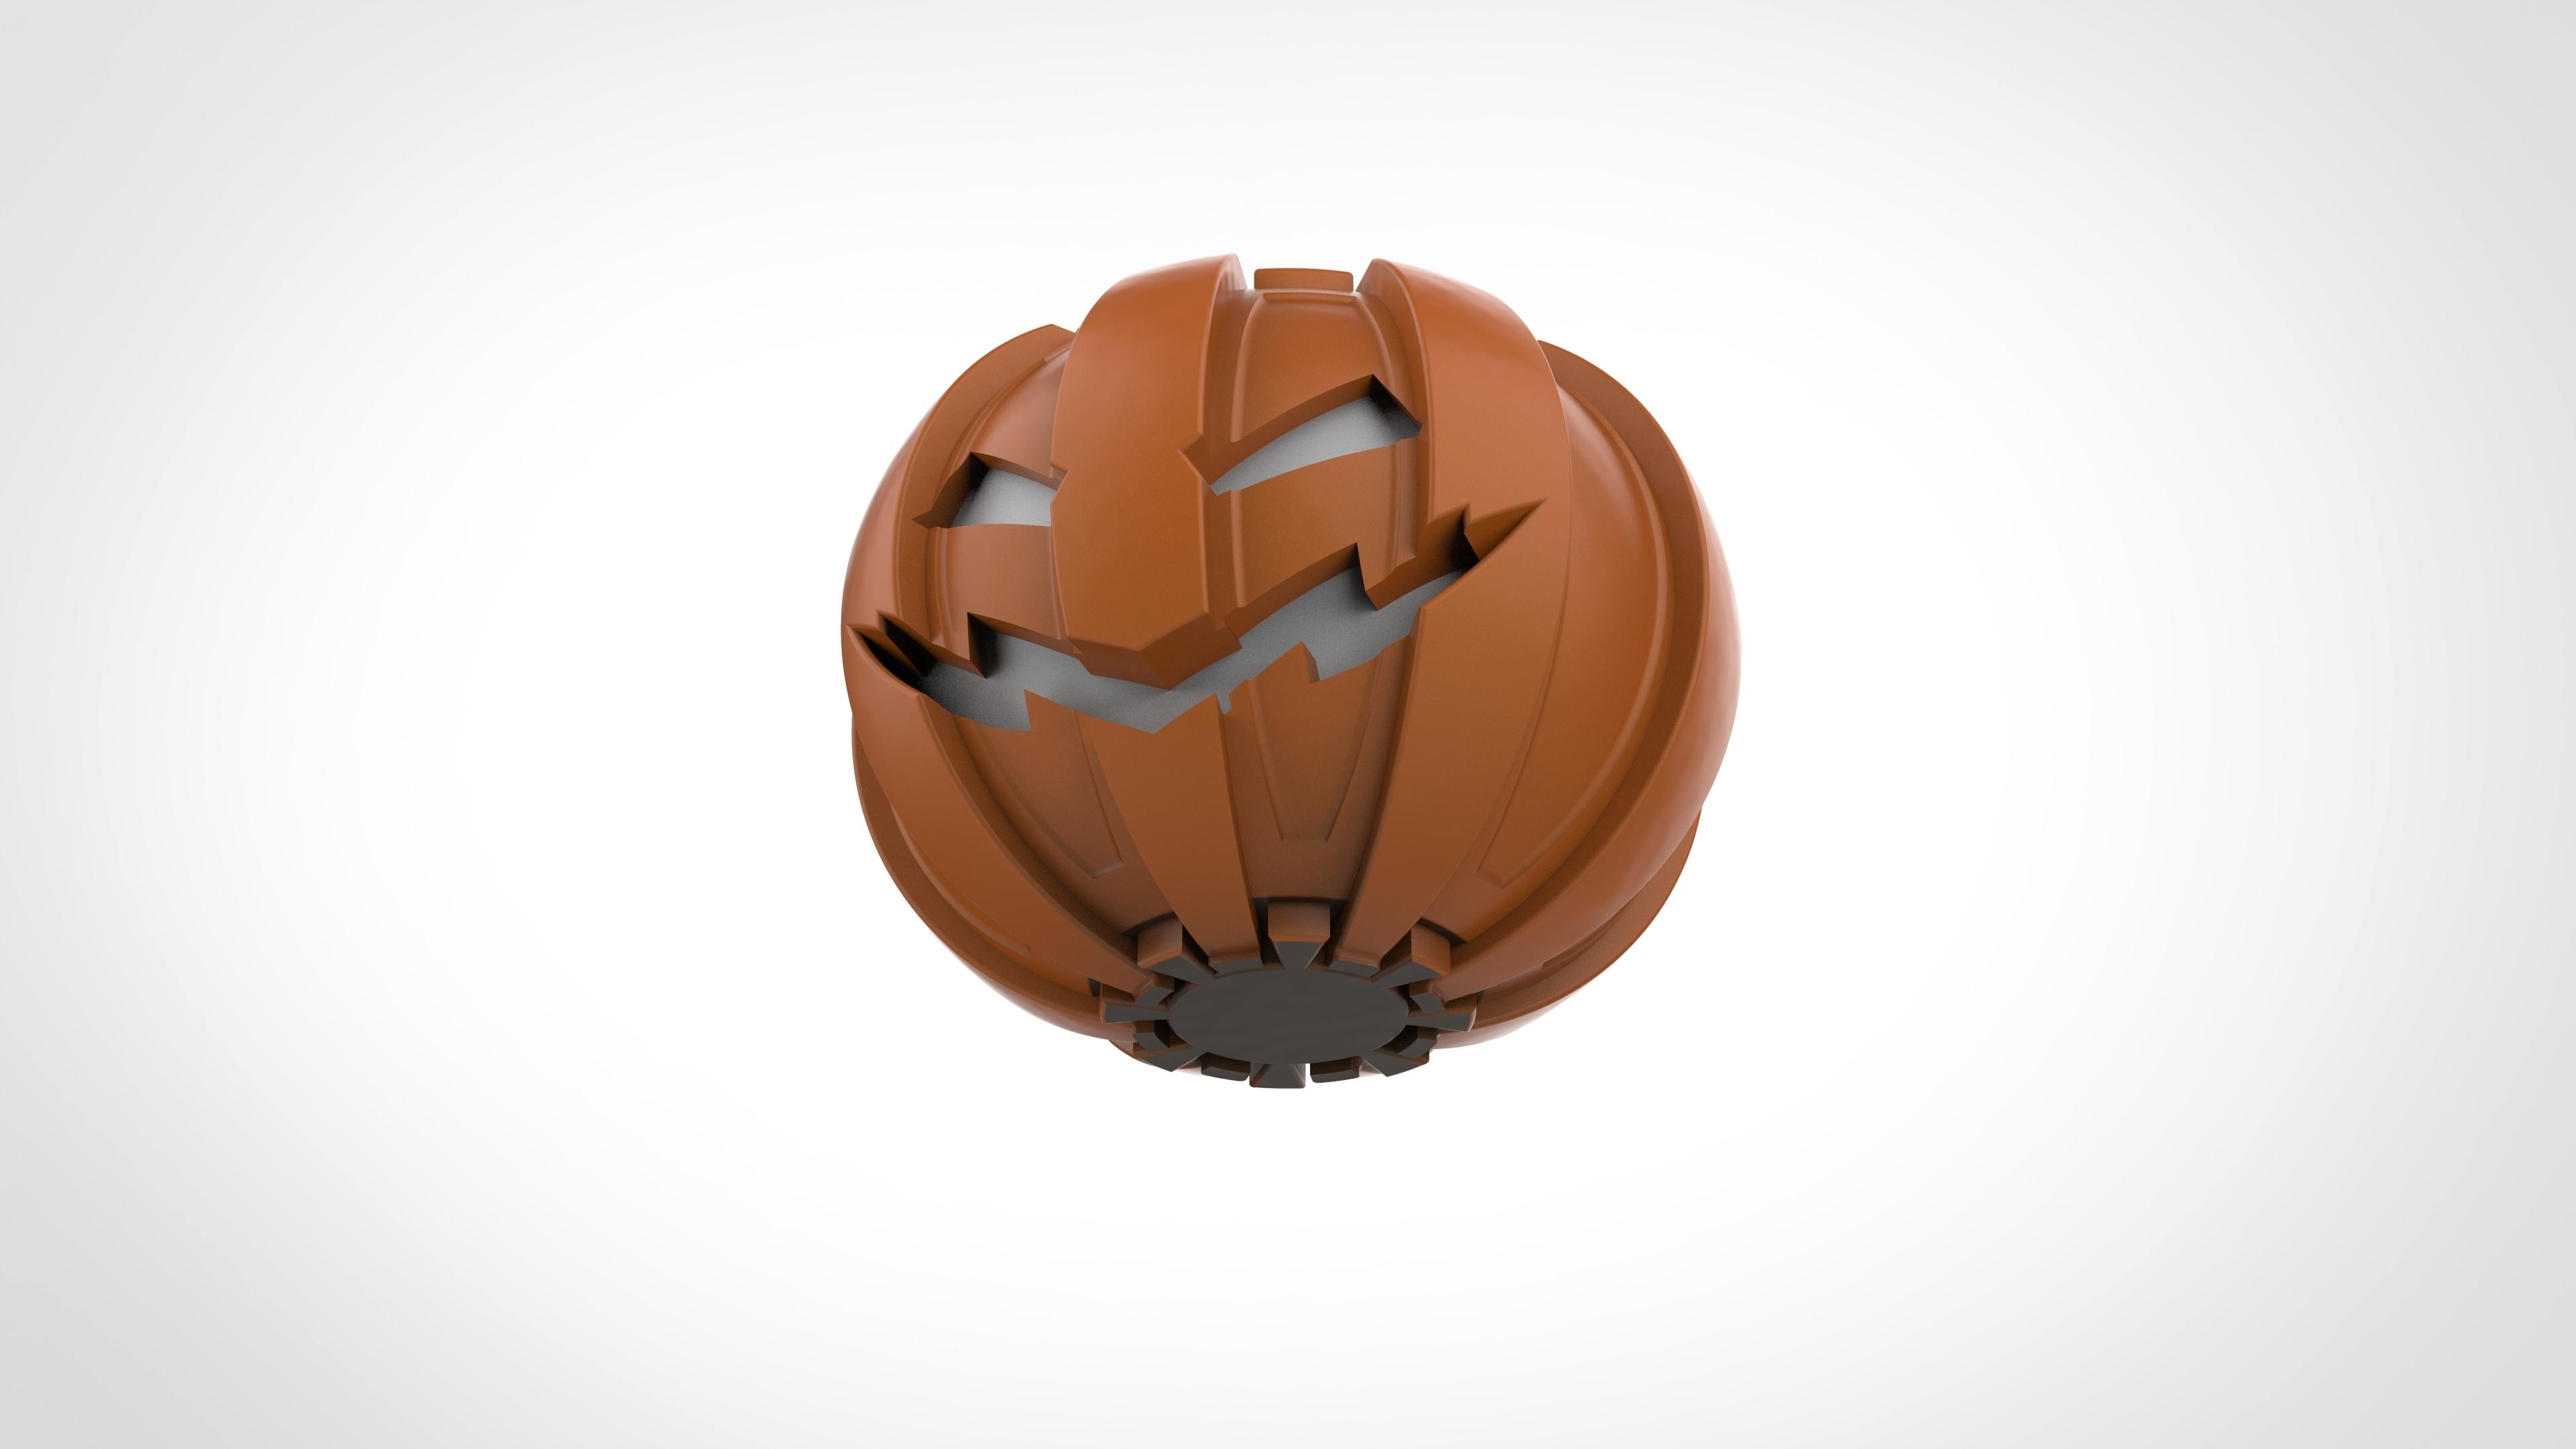 006.jpg Download 3MF file Green goblin bombs from the Spide-Man comics • 3D print model, vetrock